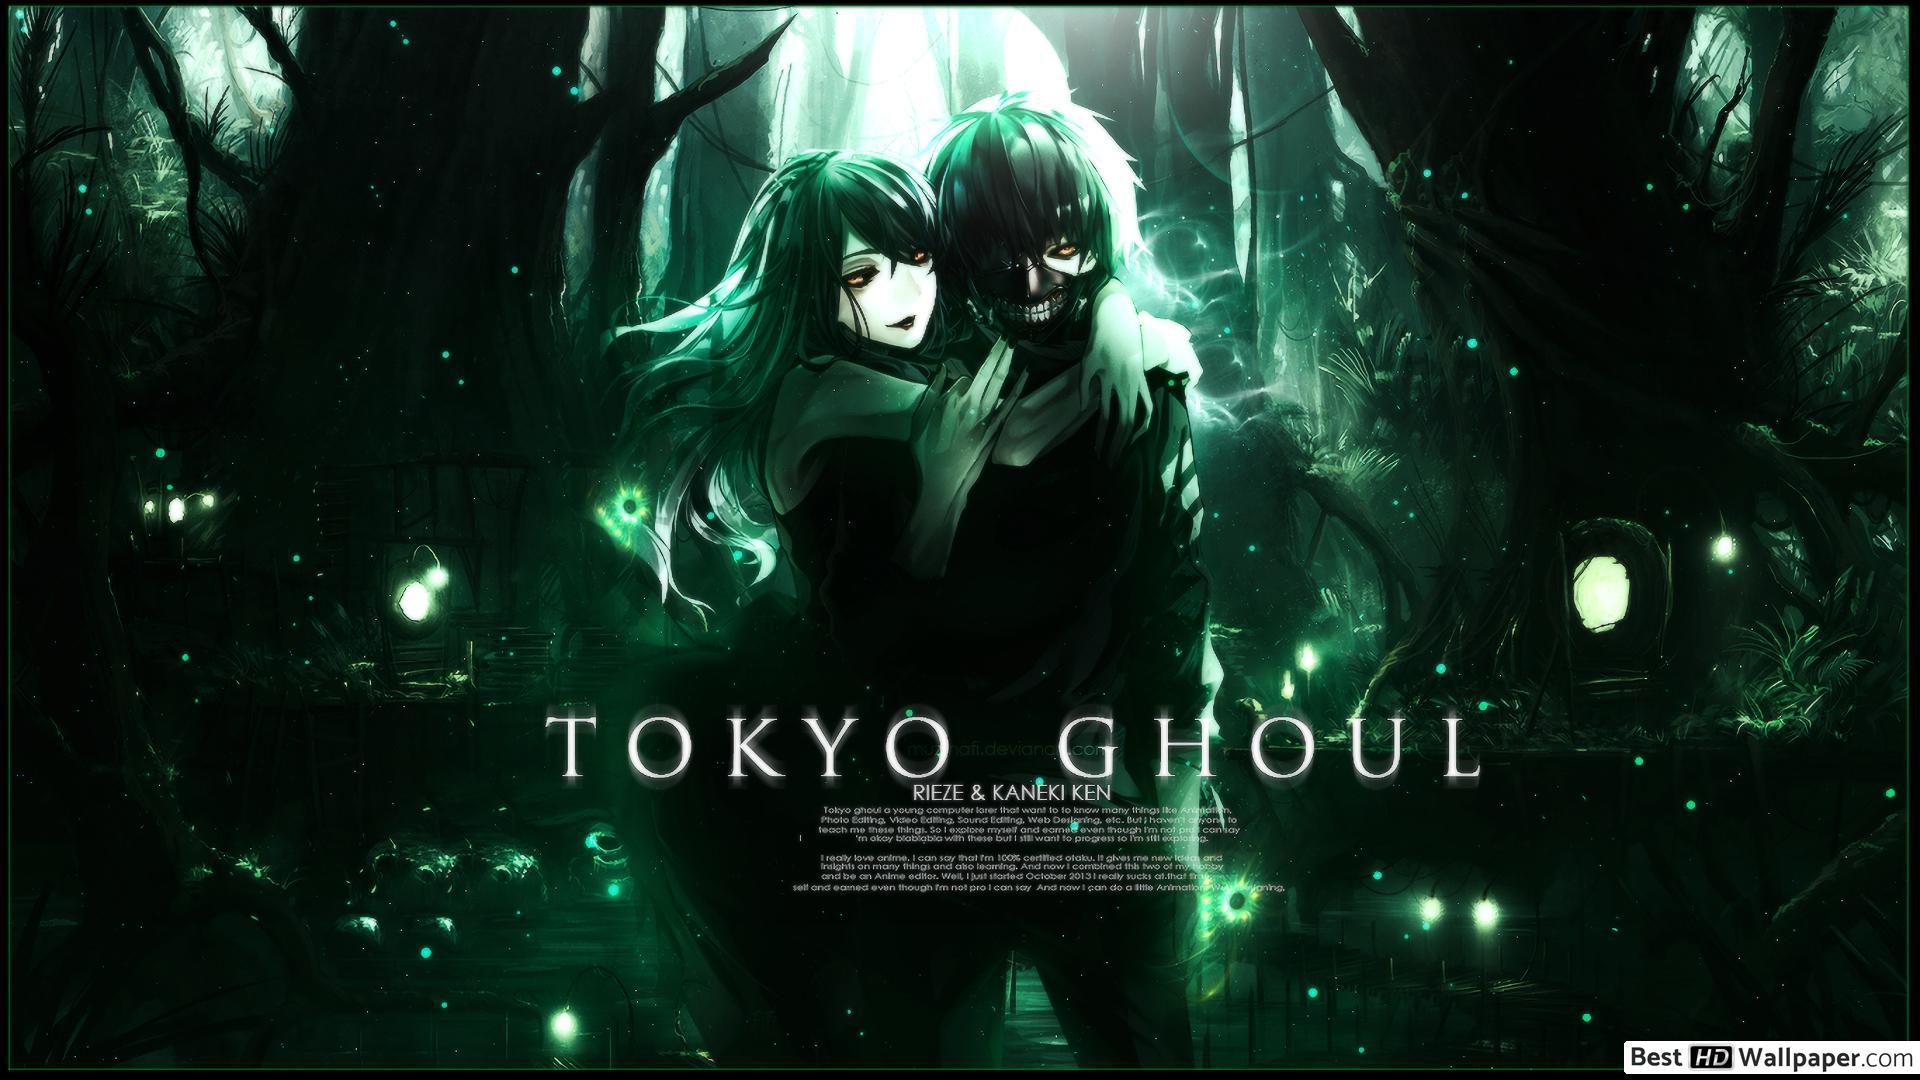 Tokyo Ghoul Wallpaper Kaneki Posted By John Anderson